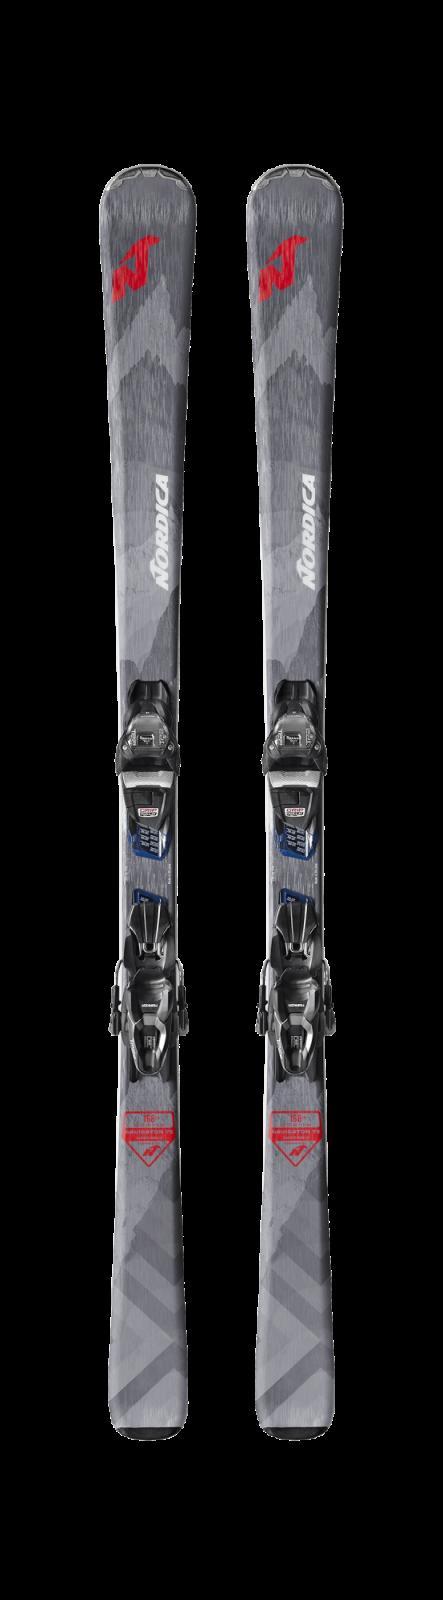 Nordica Navigator 75 CA Skis w/Bindings